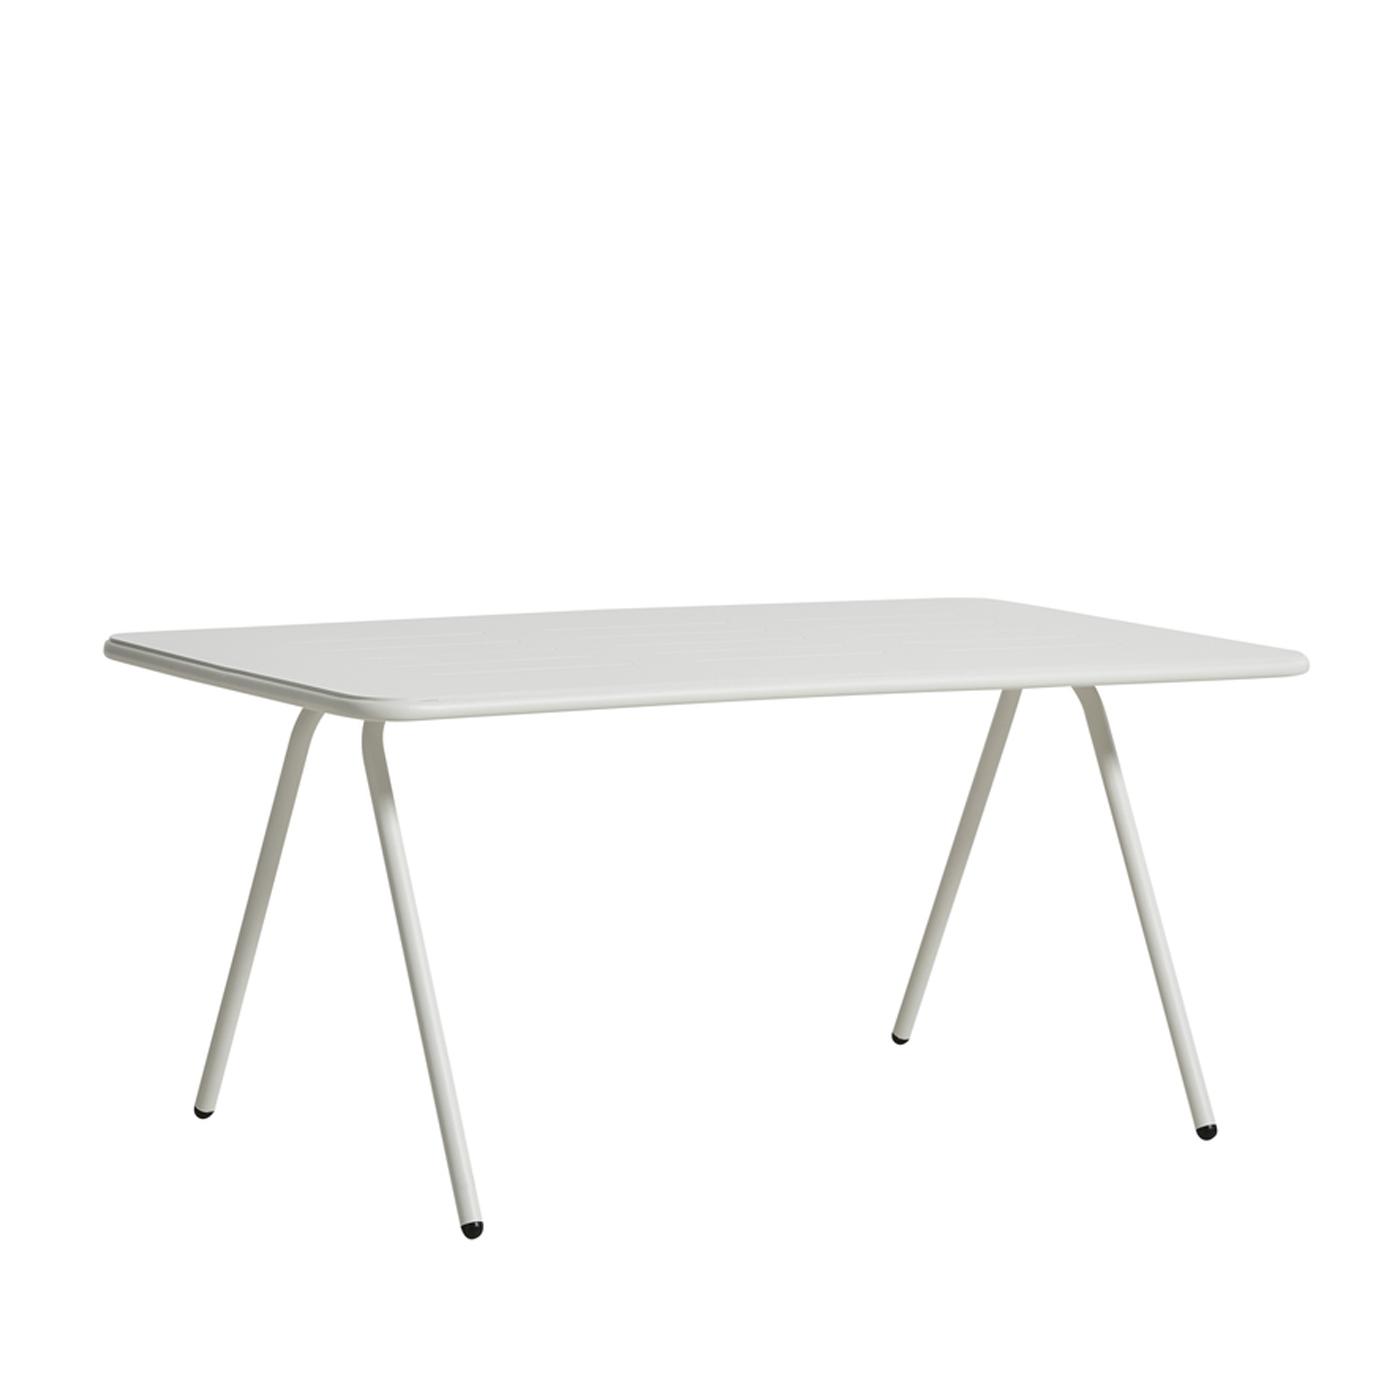 WOUD Ray spisebord - hvid aluminium, rektangulær (160x85)